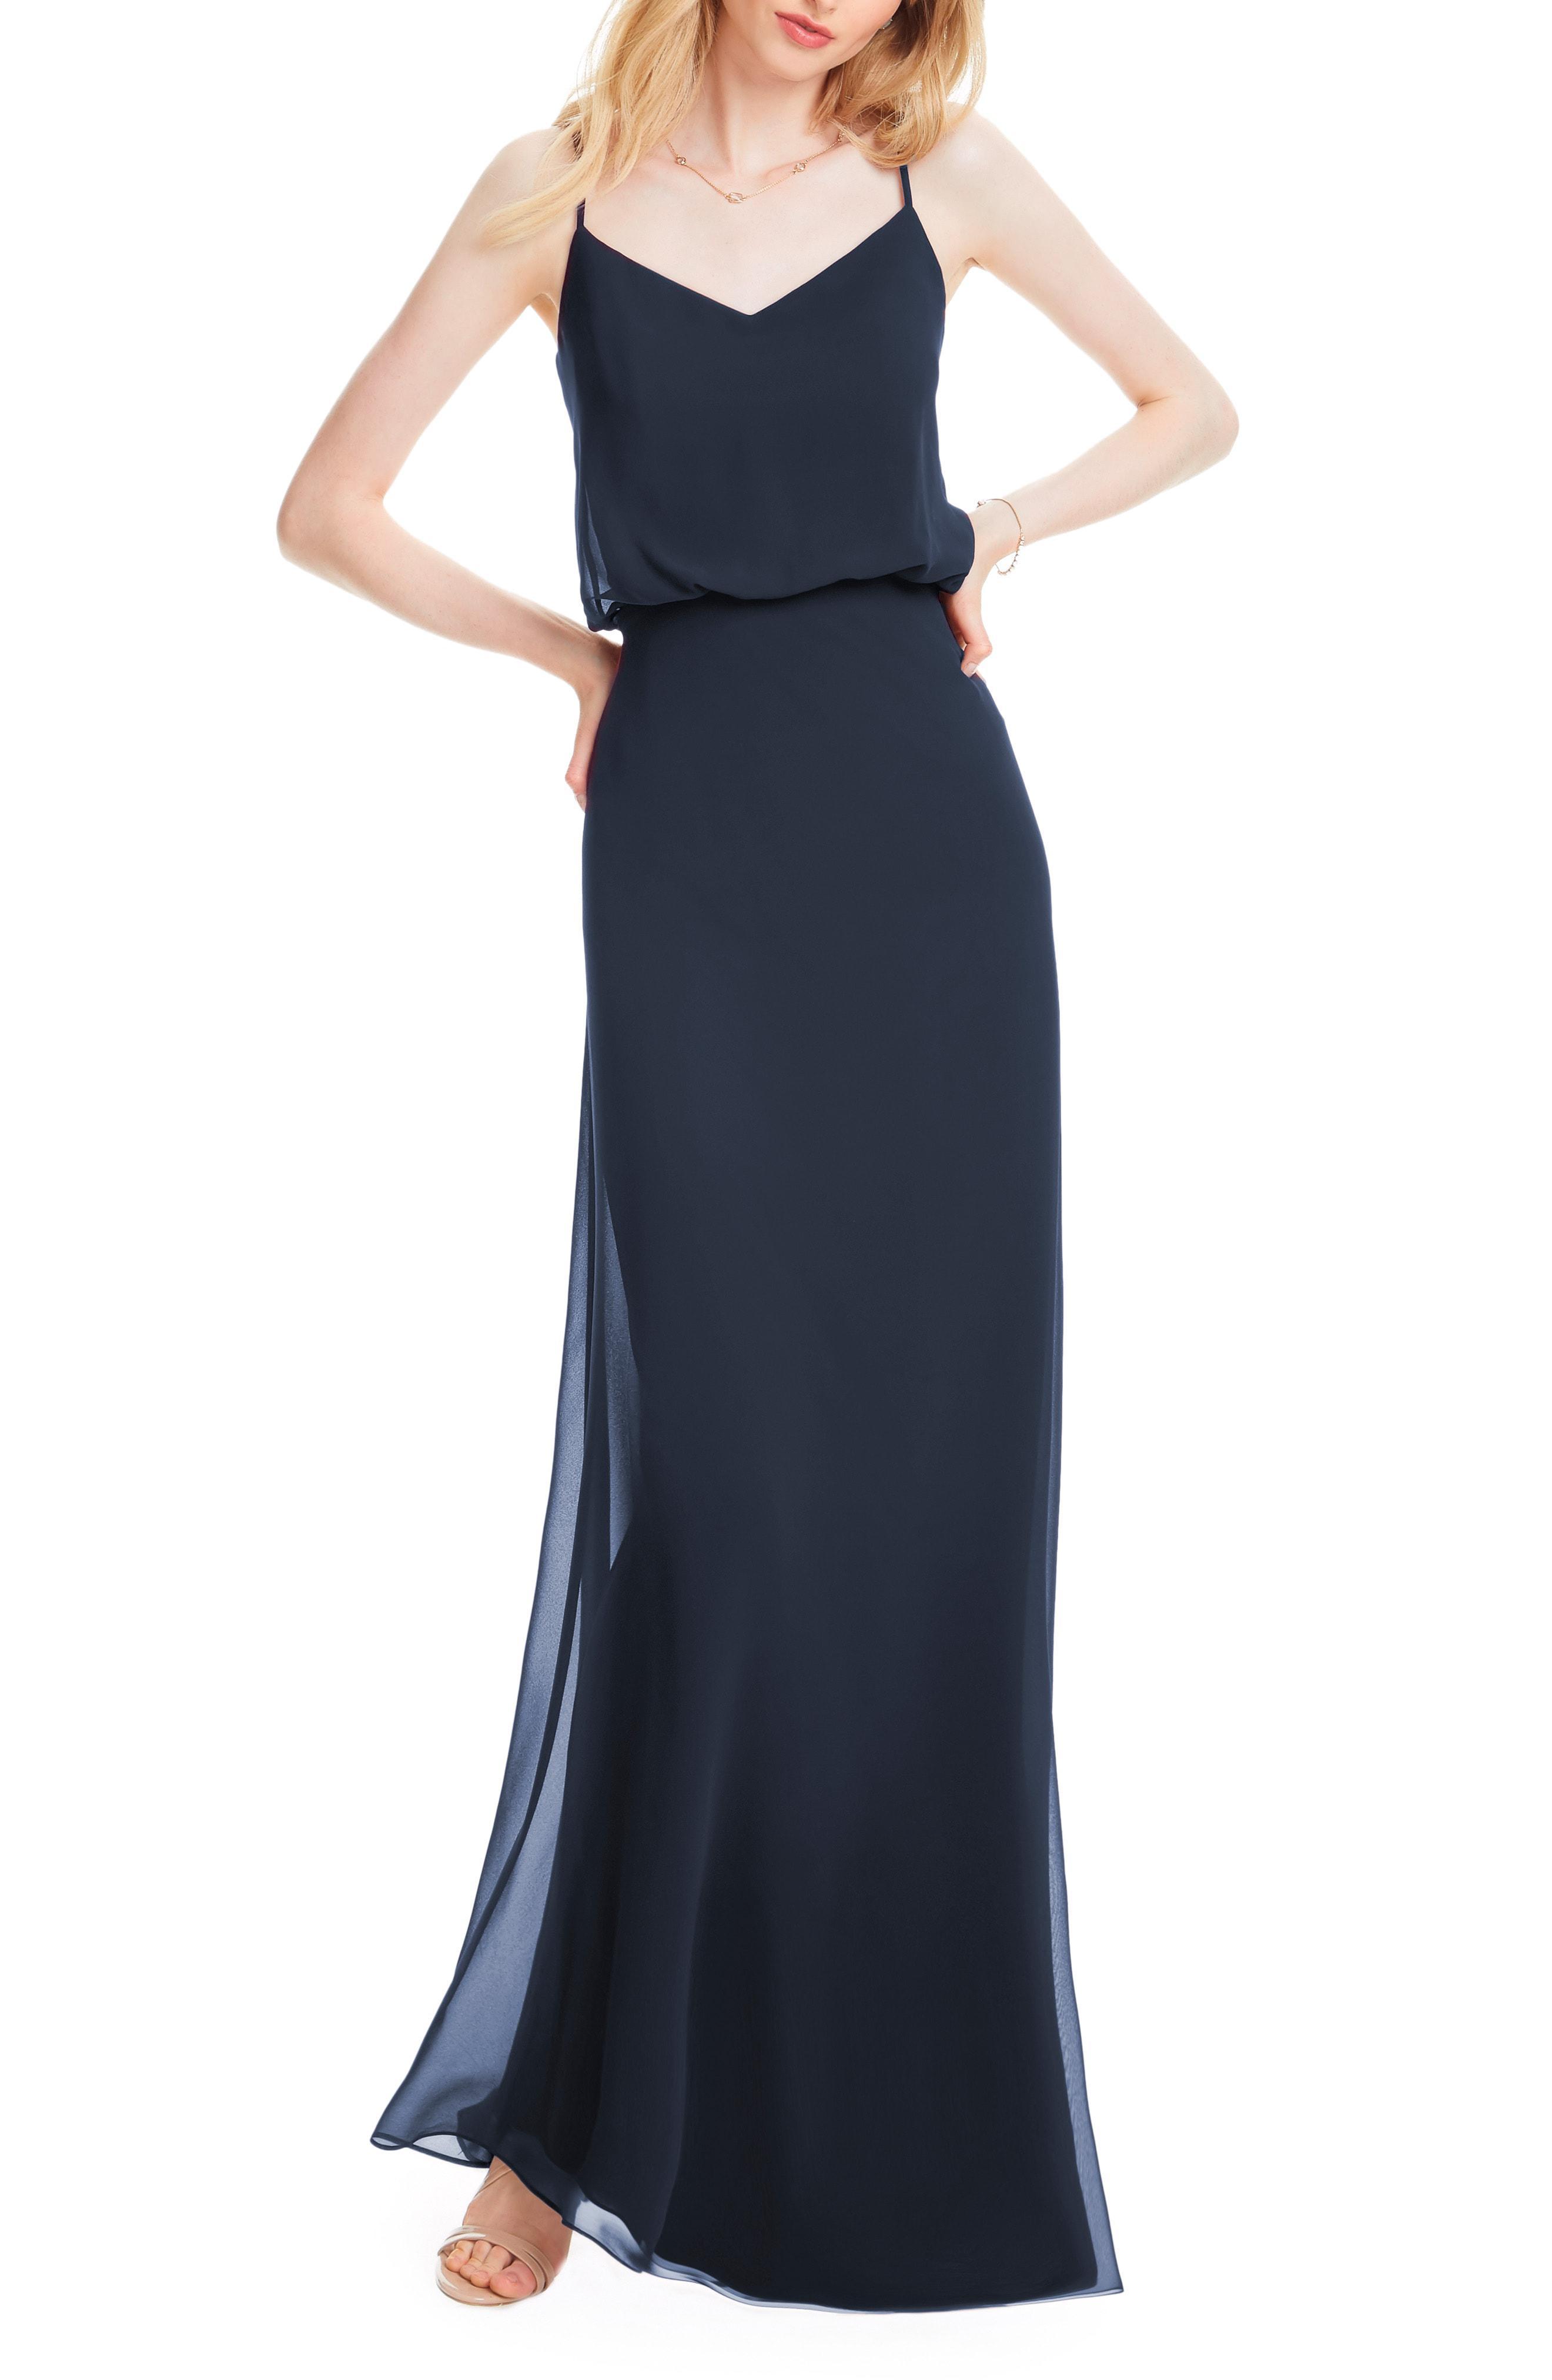 c5933260f060 Bill Levkoff. Women's Blue # Spaghetti Strap Chiffon Gown